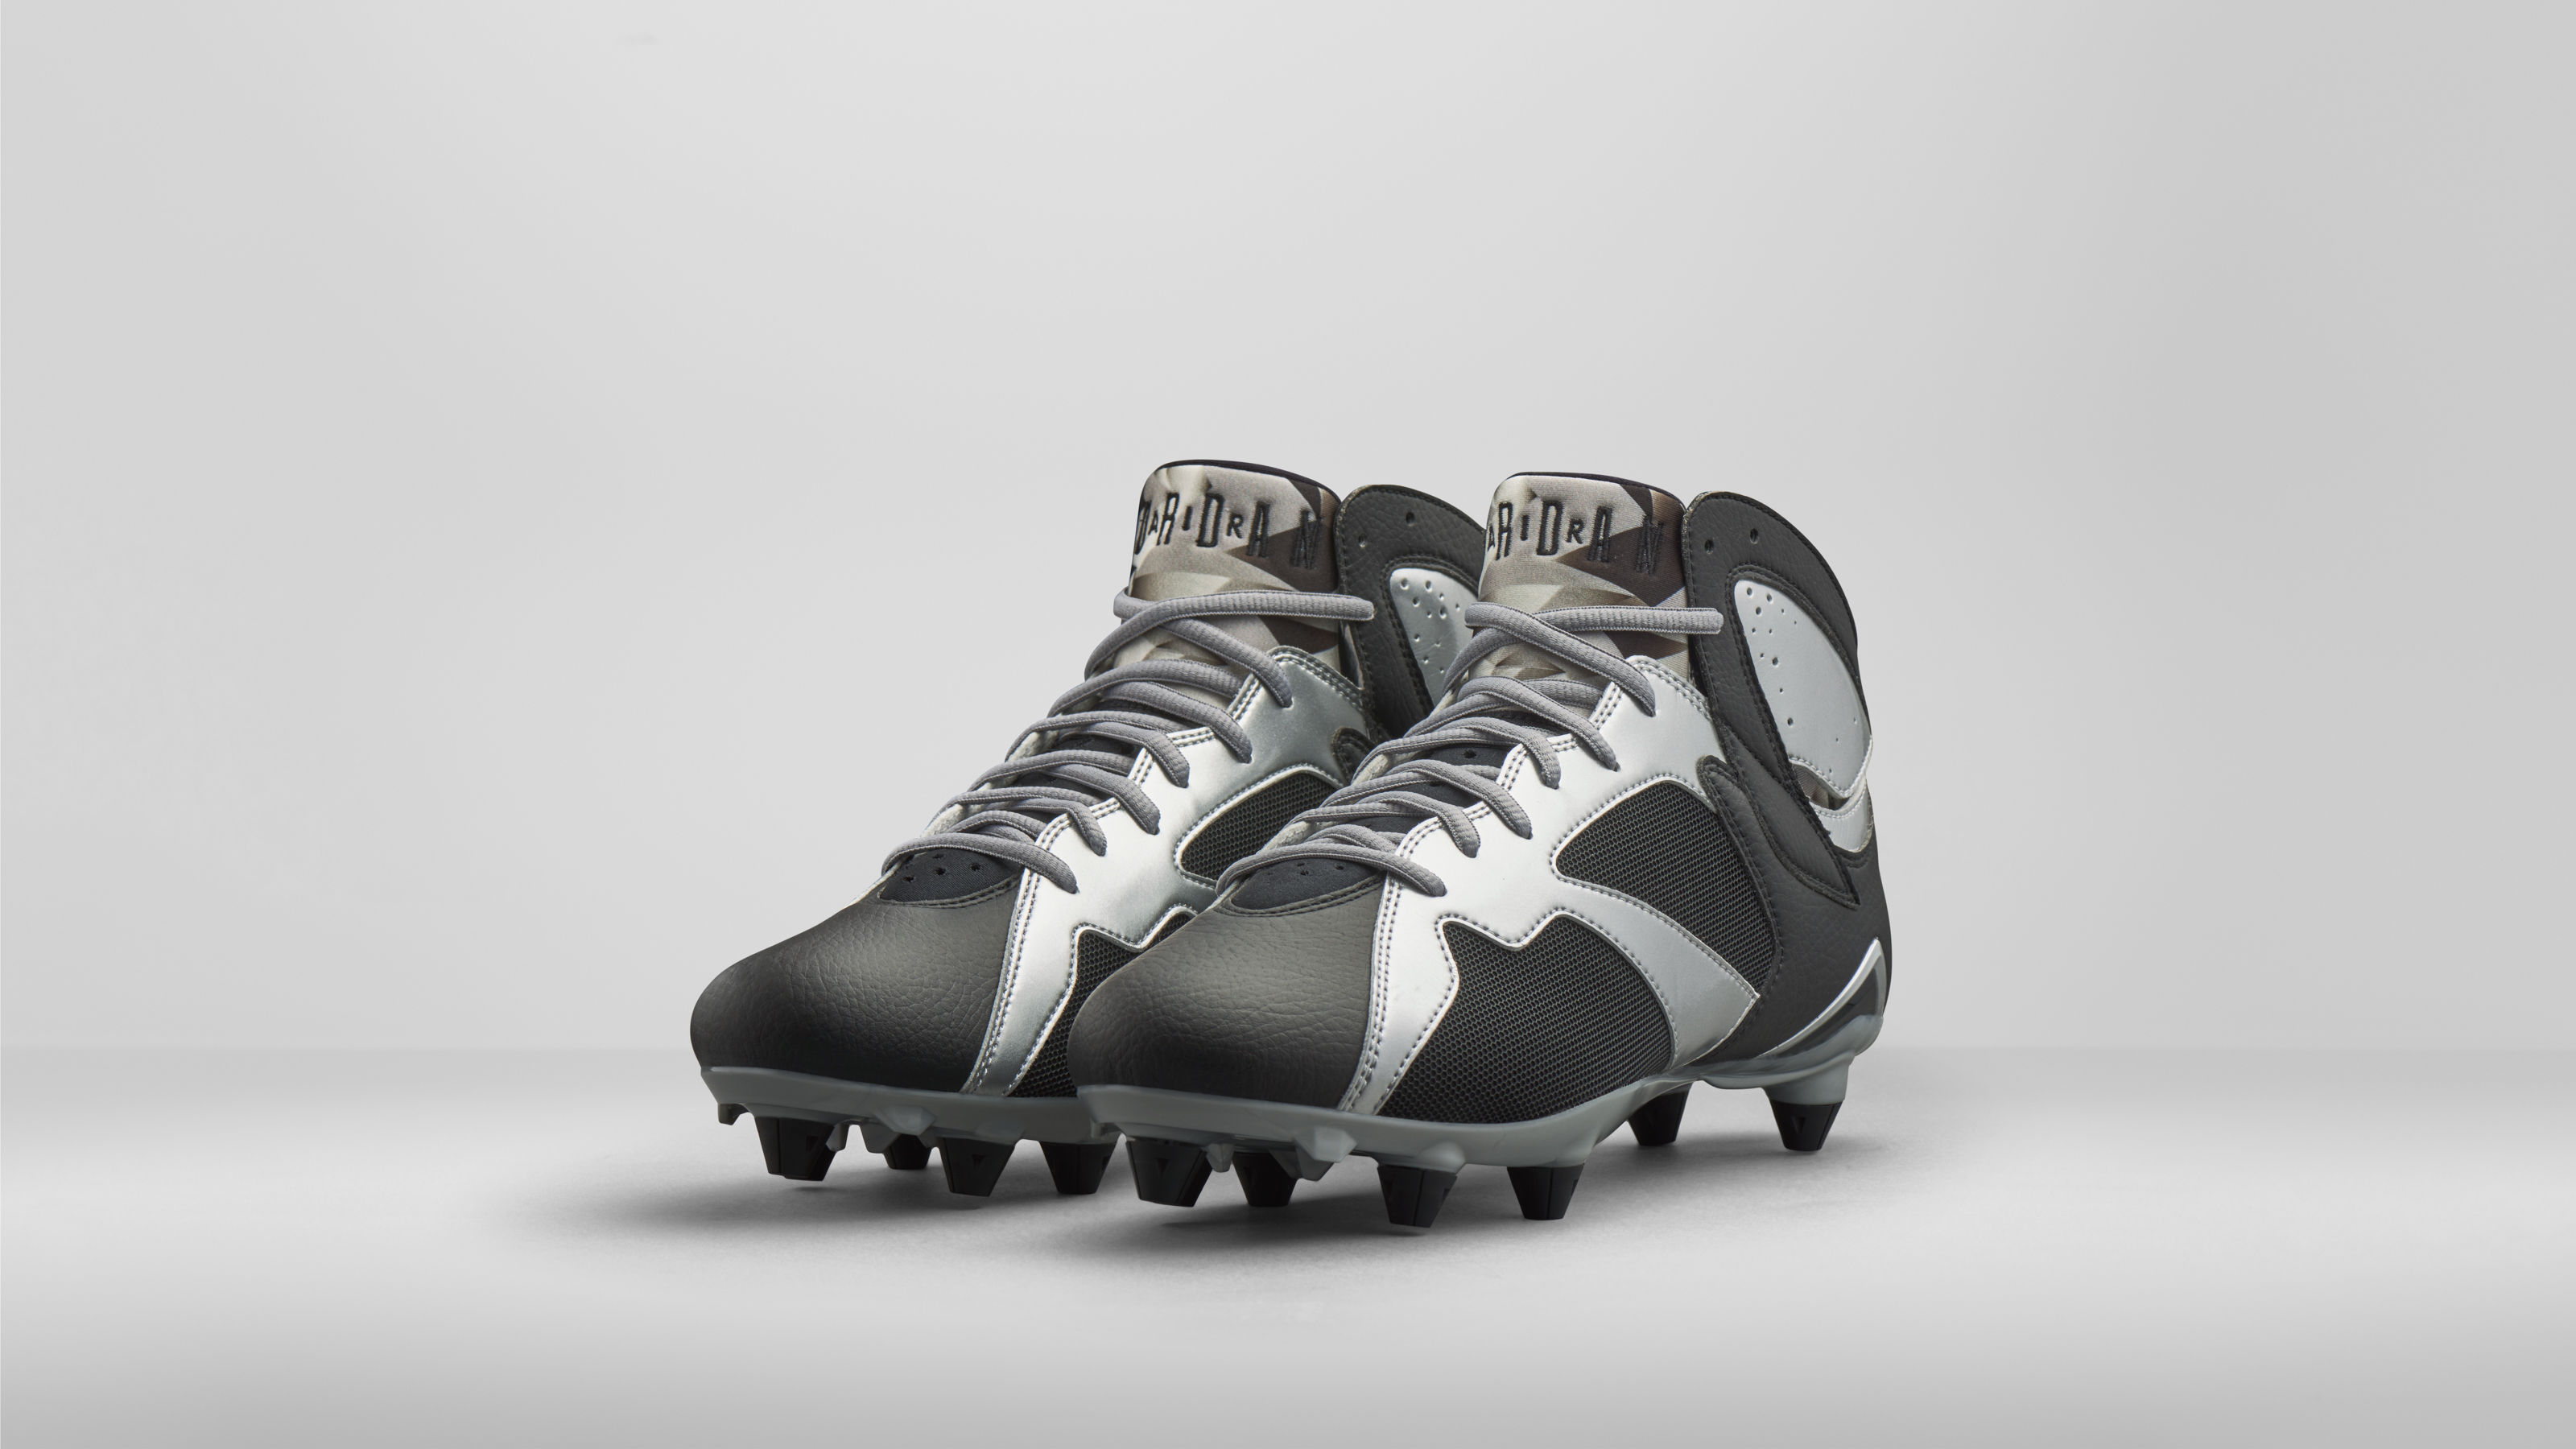 f96463823c06 ... Charles Woodson 34 · Earl Thomas Jordan Brand Athletes Take Gridiron in  AJ VII cleat - Nike N ...